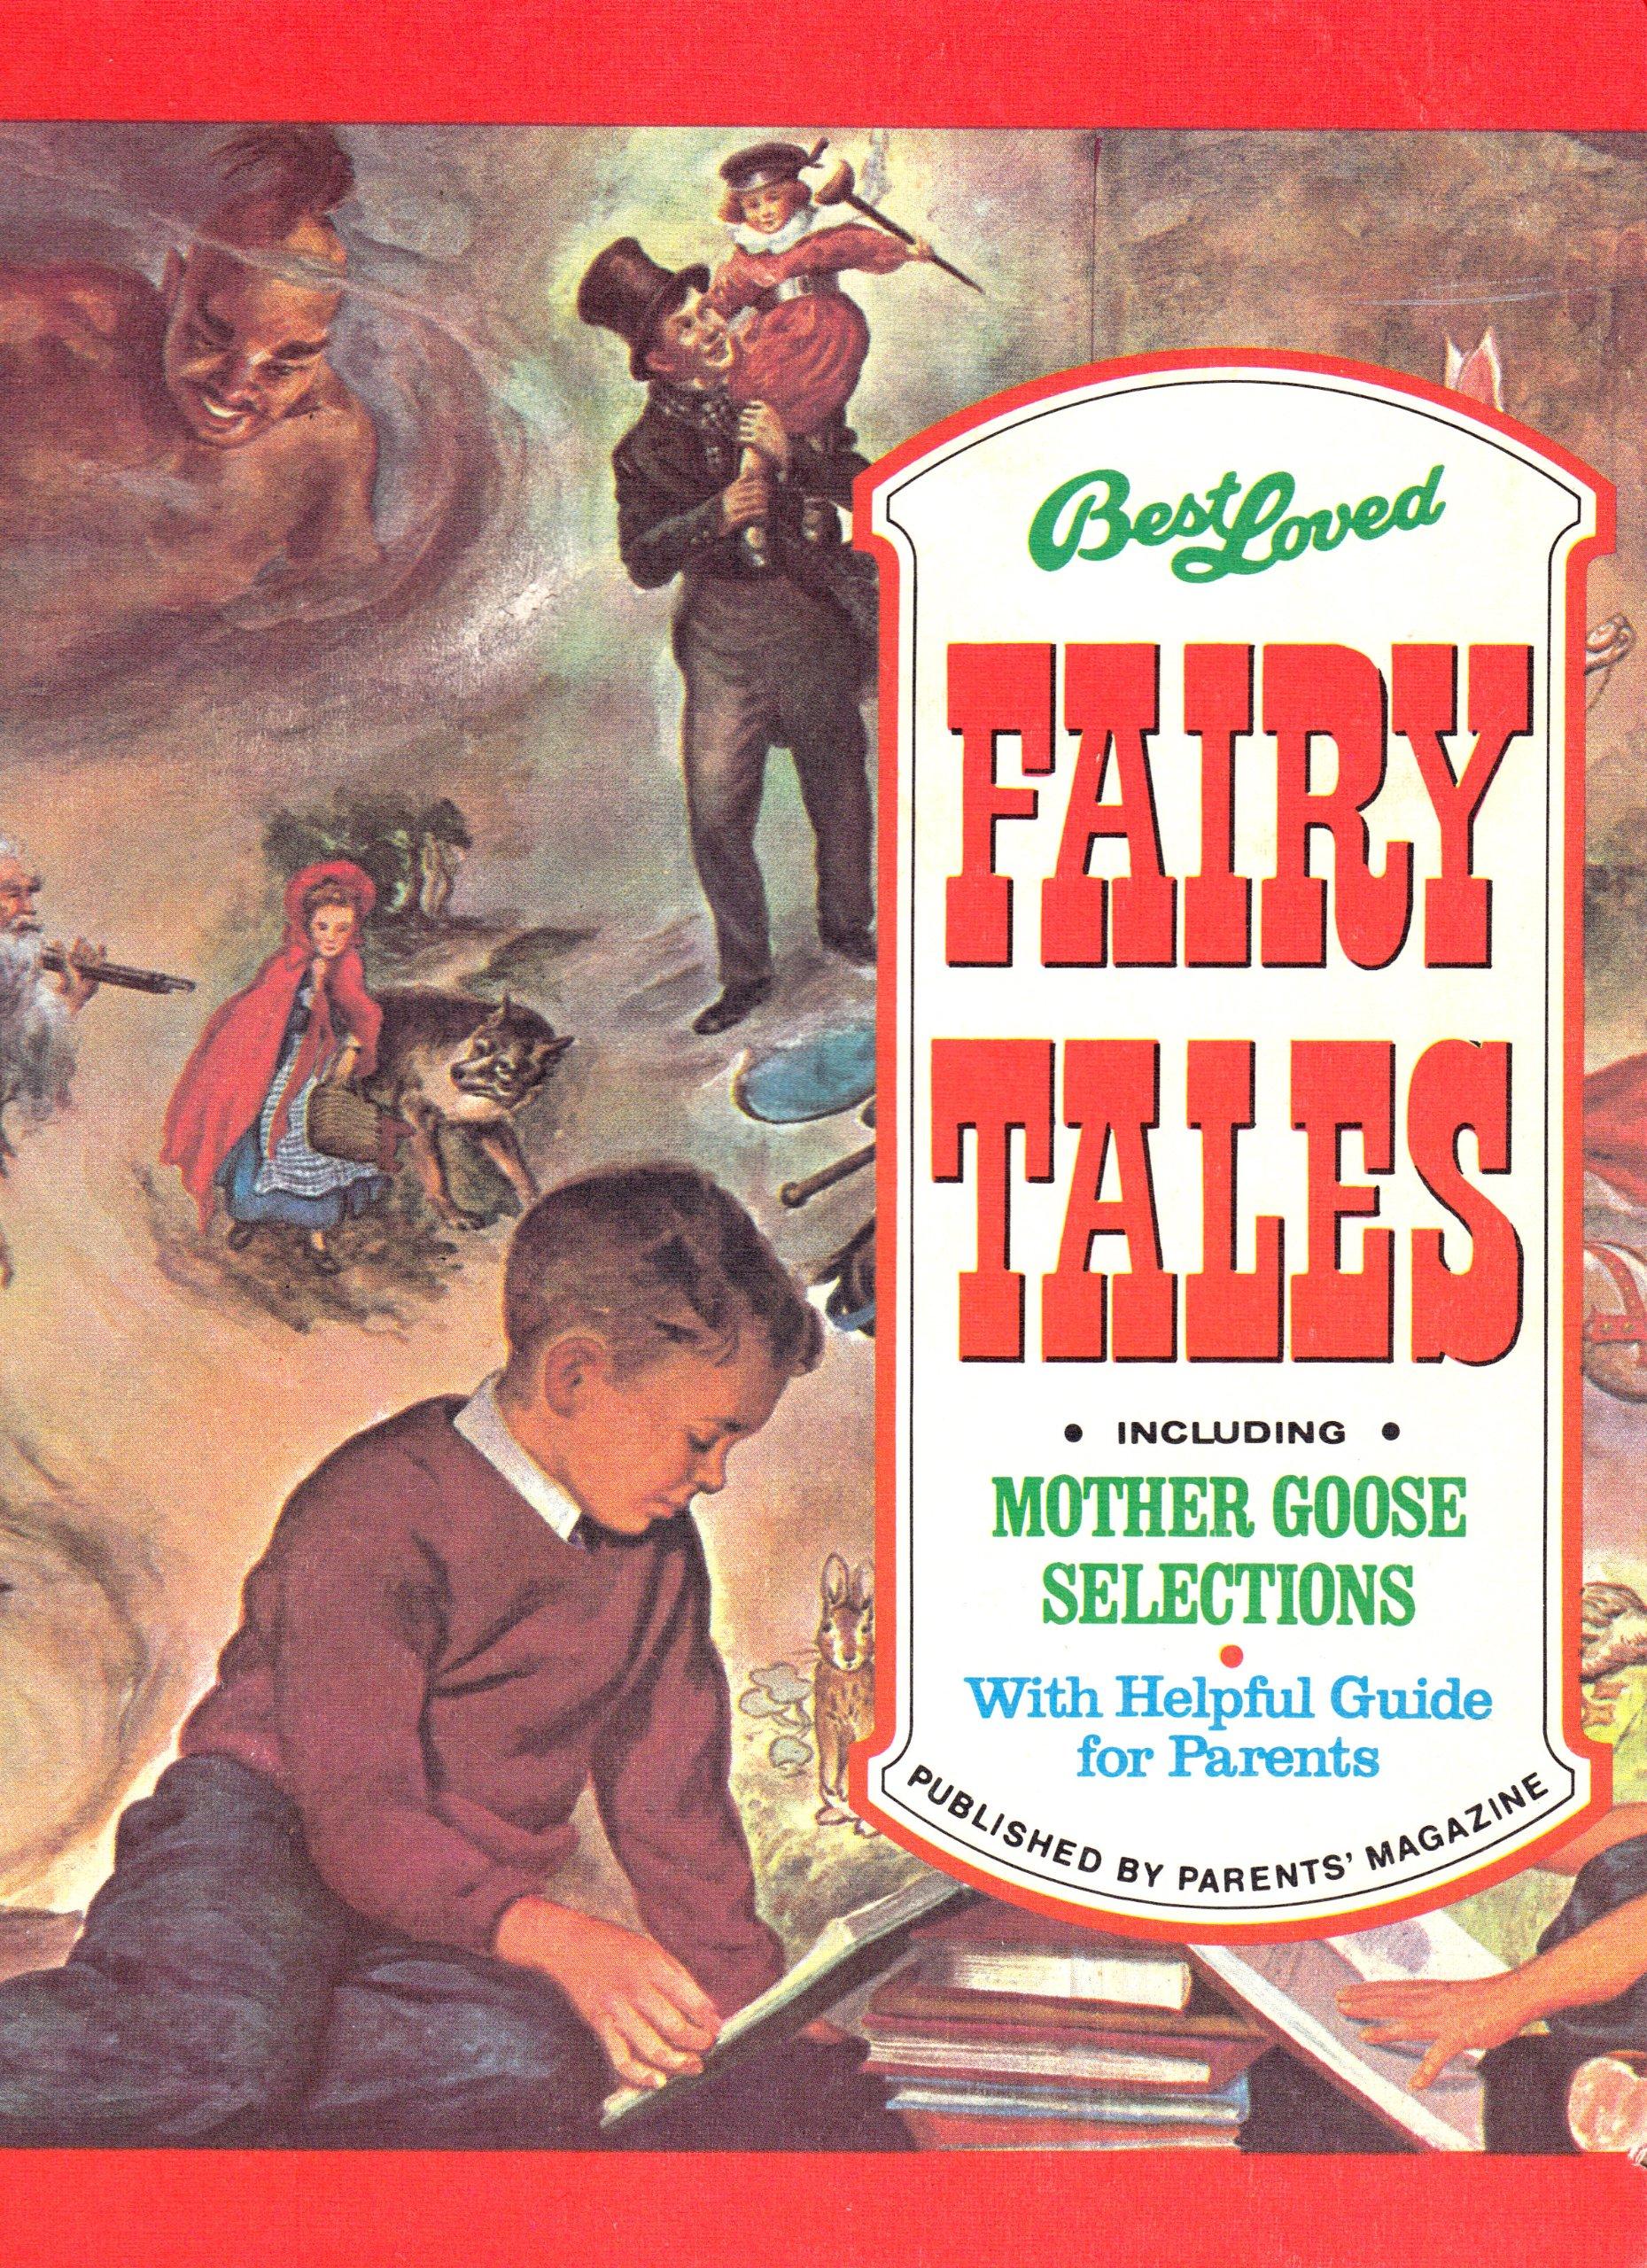 Best Loved Fairy Tales, Published By Parents' Magazine, PARENTS MAZ